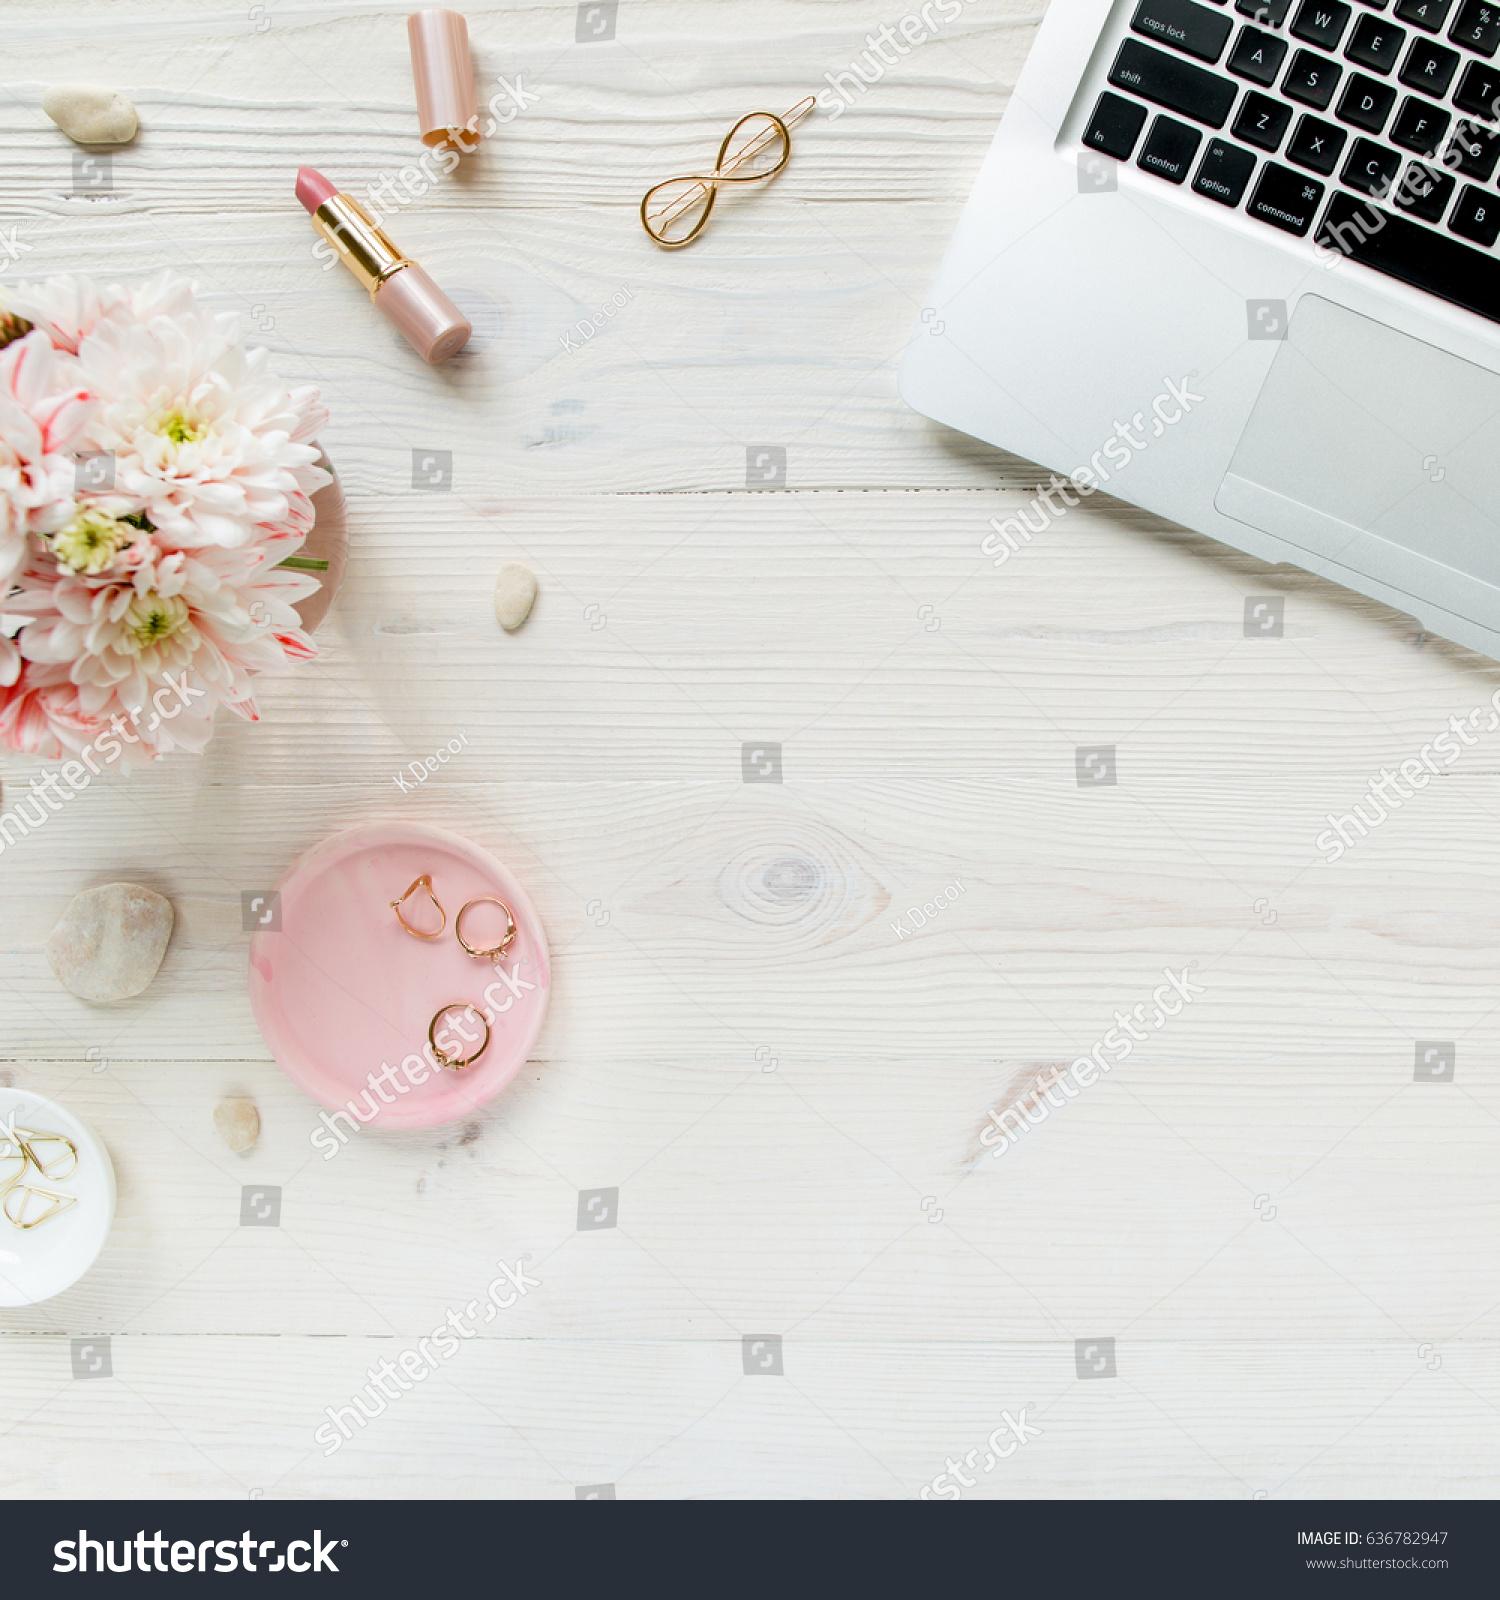 gifford my the women writing com by novelicious elisabeth s desk room pi